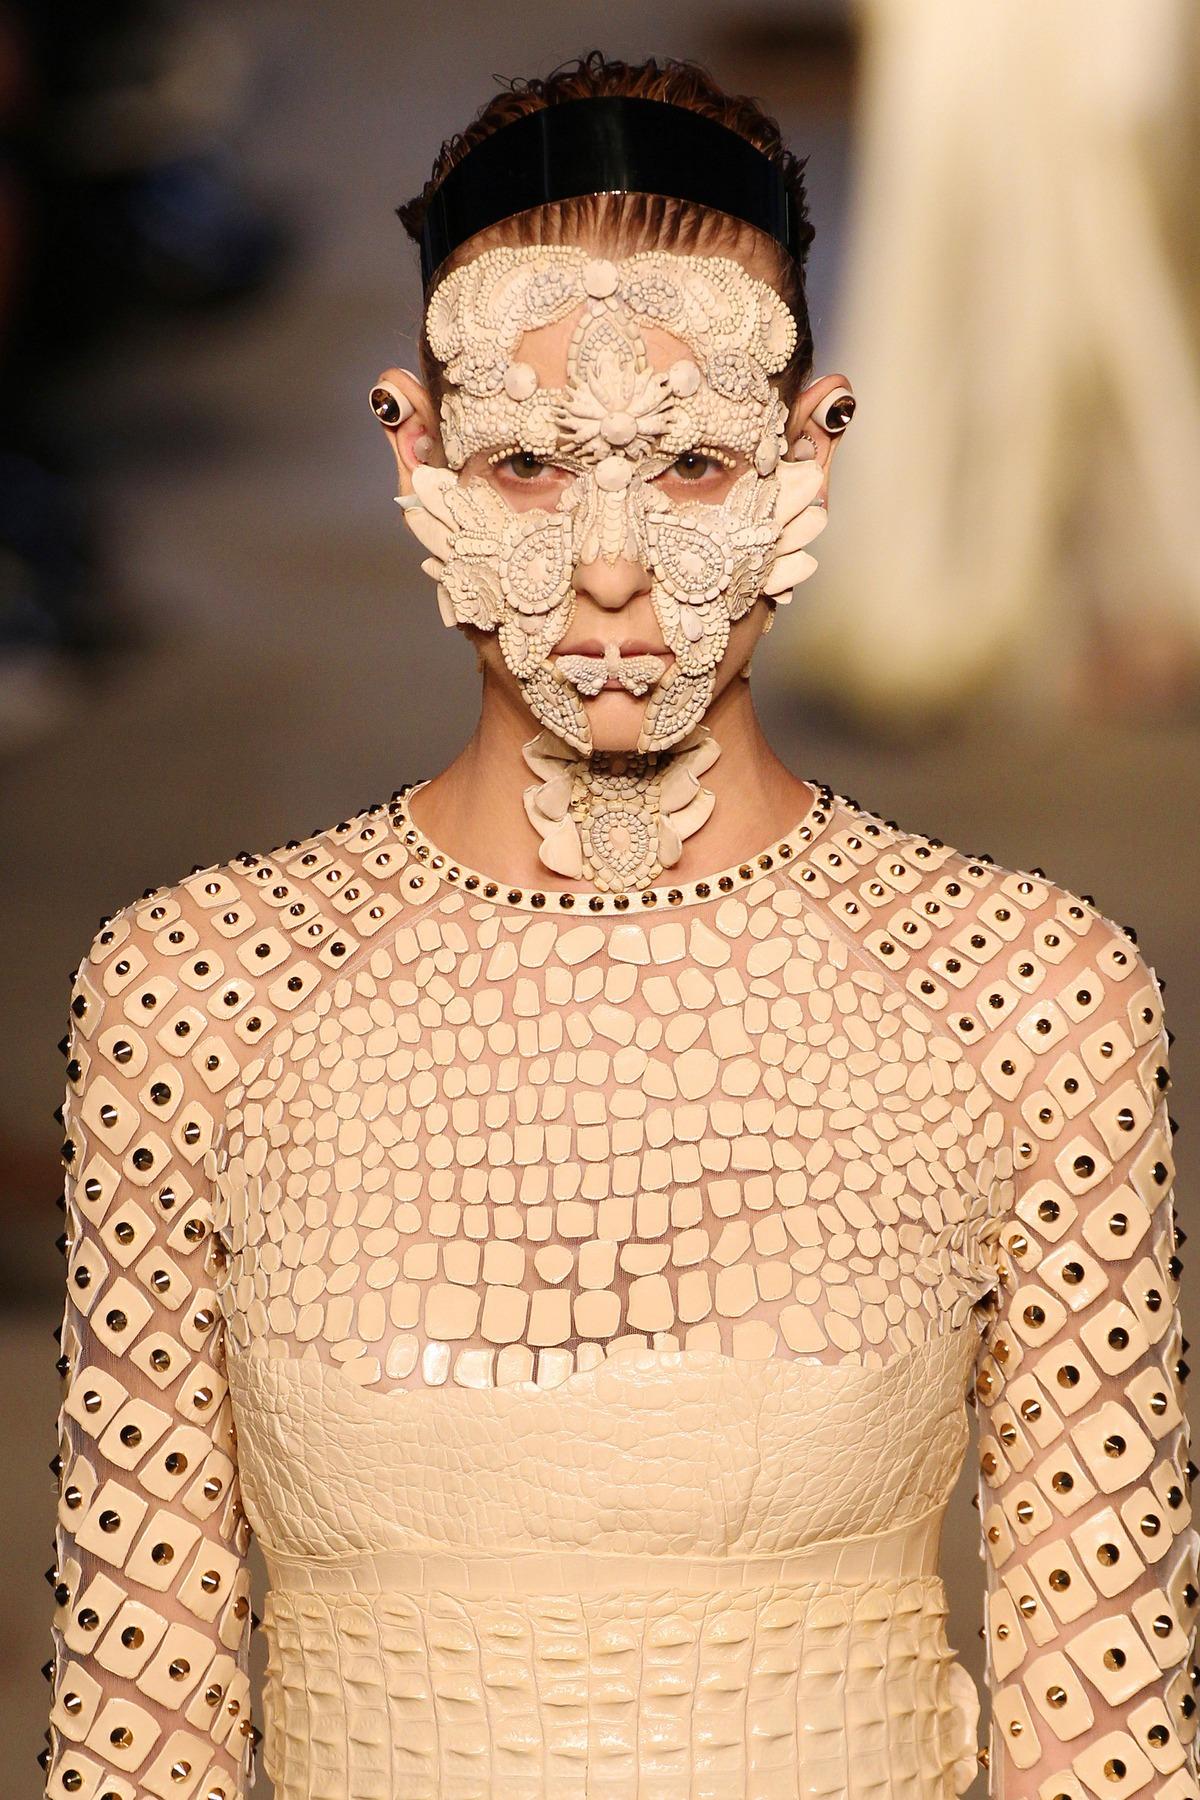 Givenchy makeup SS16 17